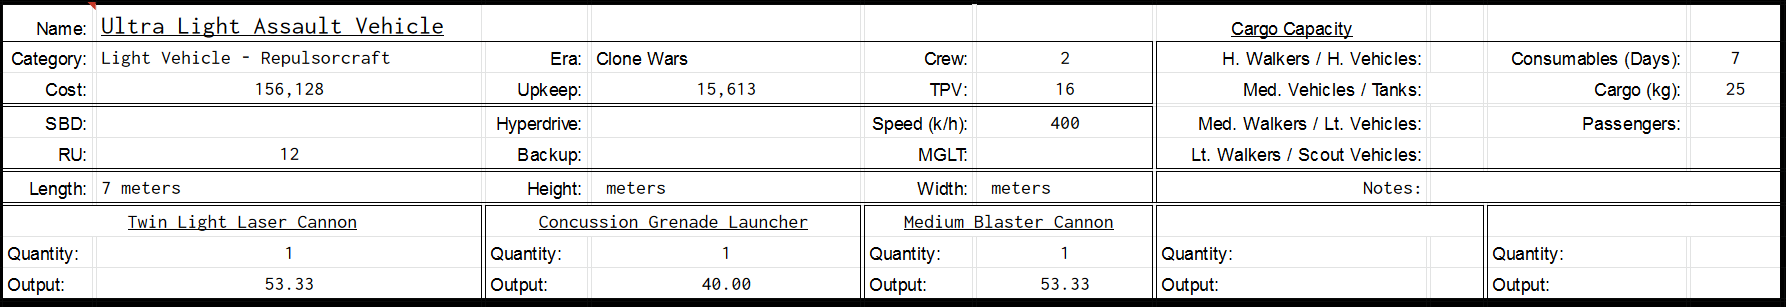 [Image: Ultra_Light_Assault_Vehicle.png]